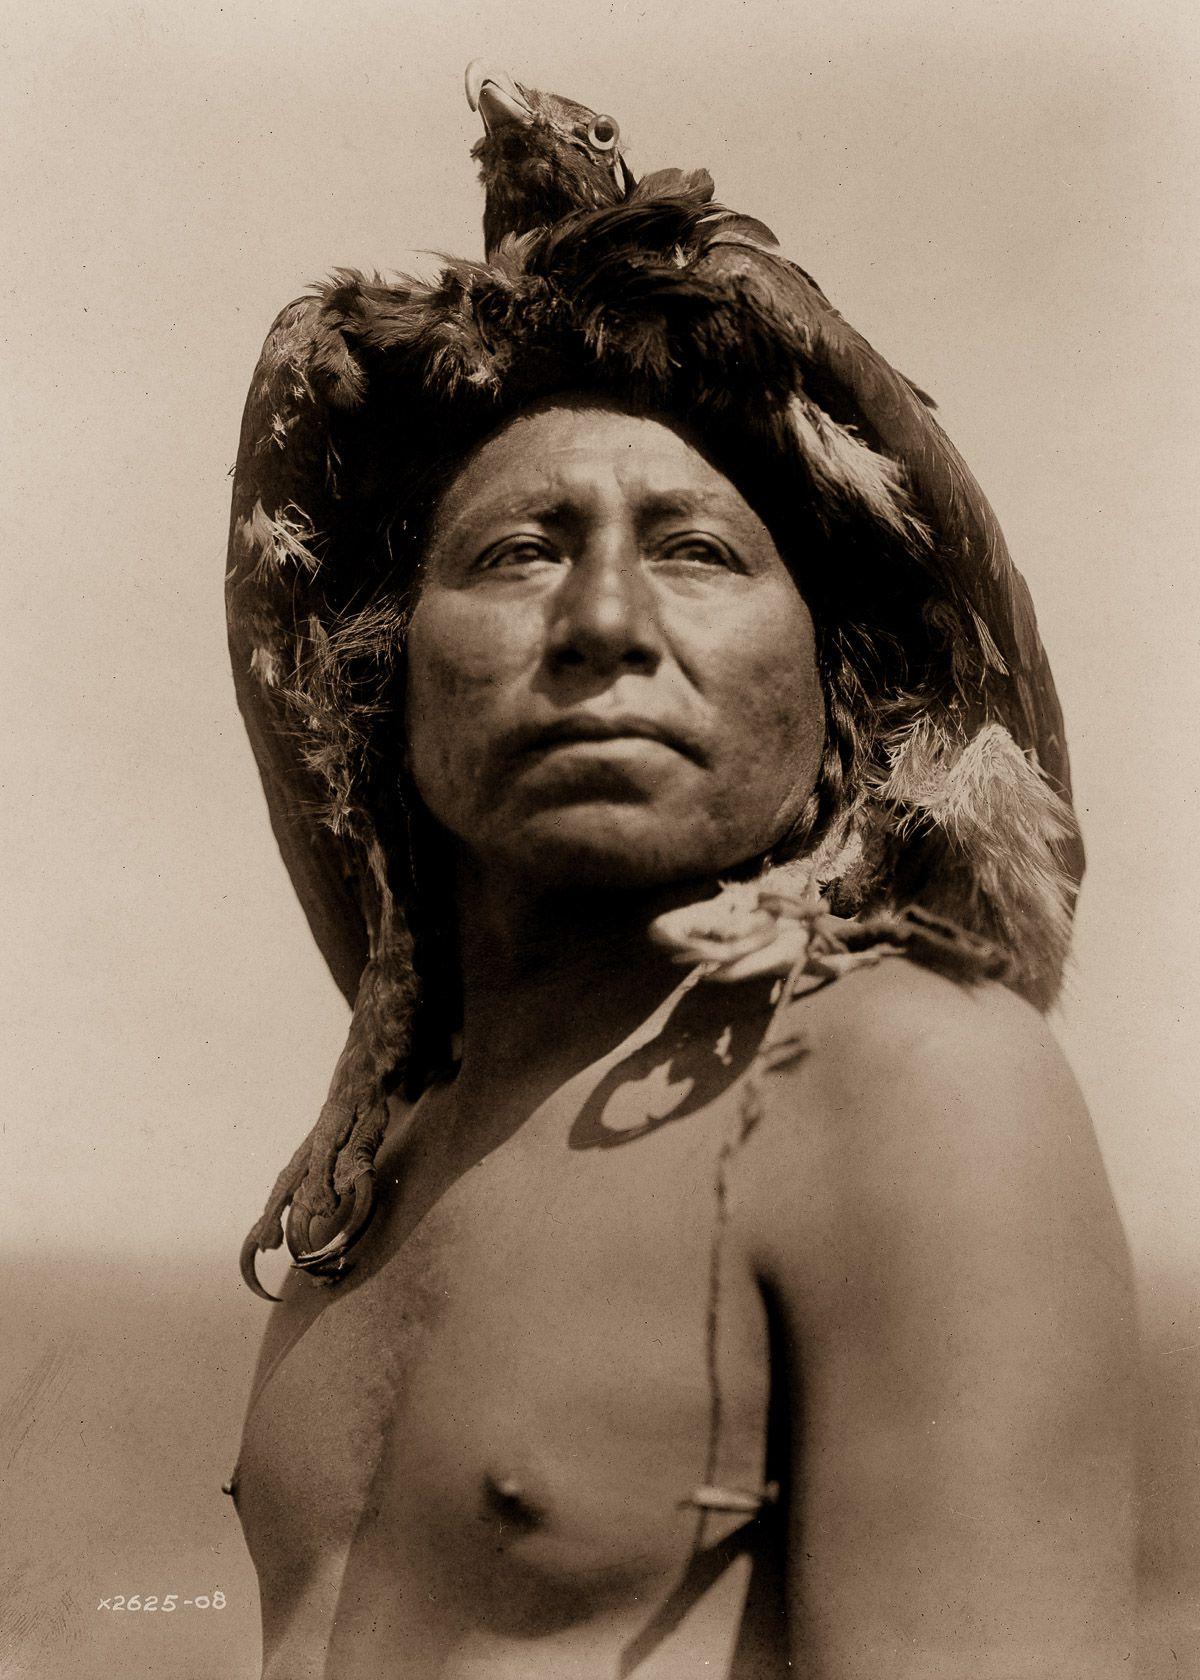 An Apsaroke shaman,  1908.  ©EDWARD S. CURTIS/LIBRARY OF CONGRESS